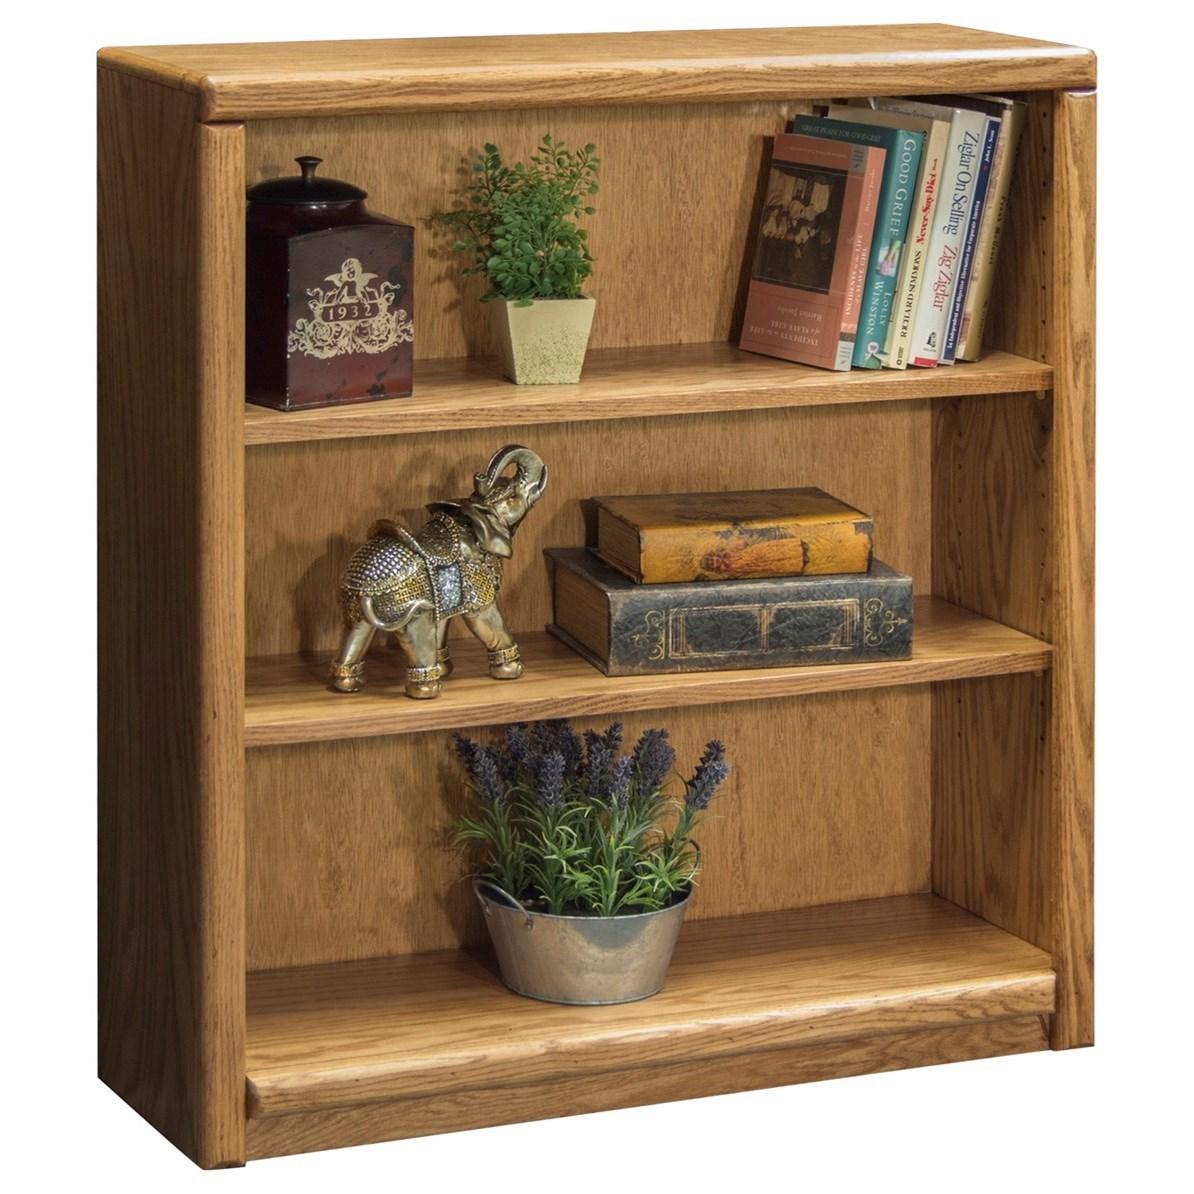 Vendor 1356 Contemporary - Value Groups Bookcase With 2 adj. Shelves - Item Number: CC6636